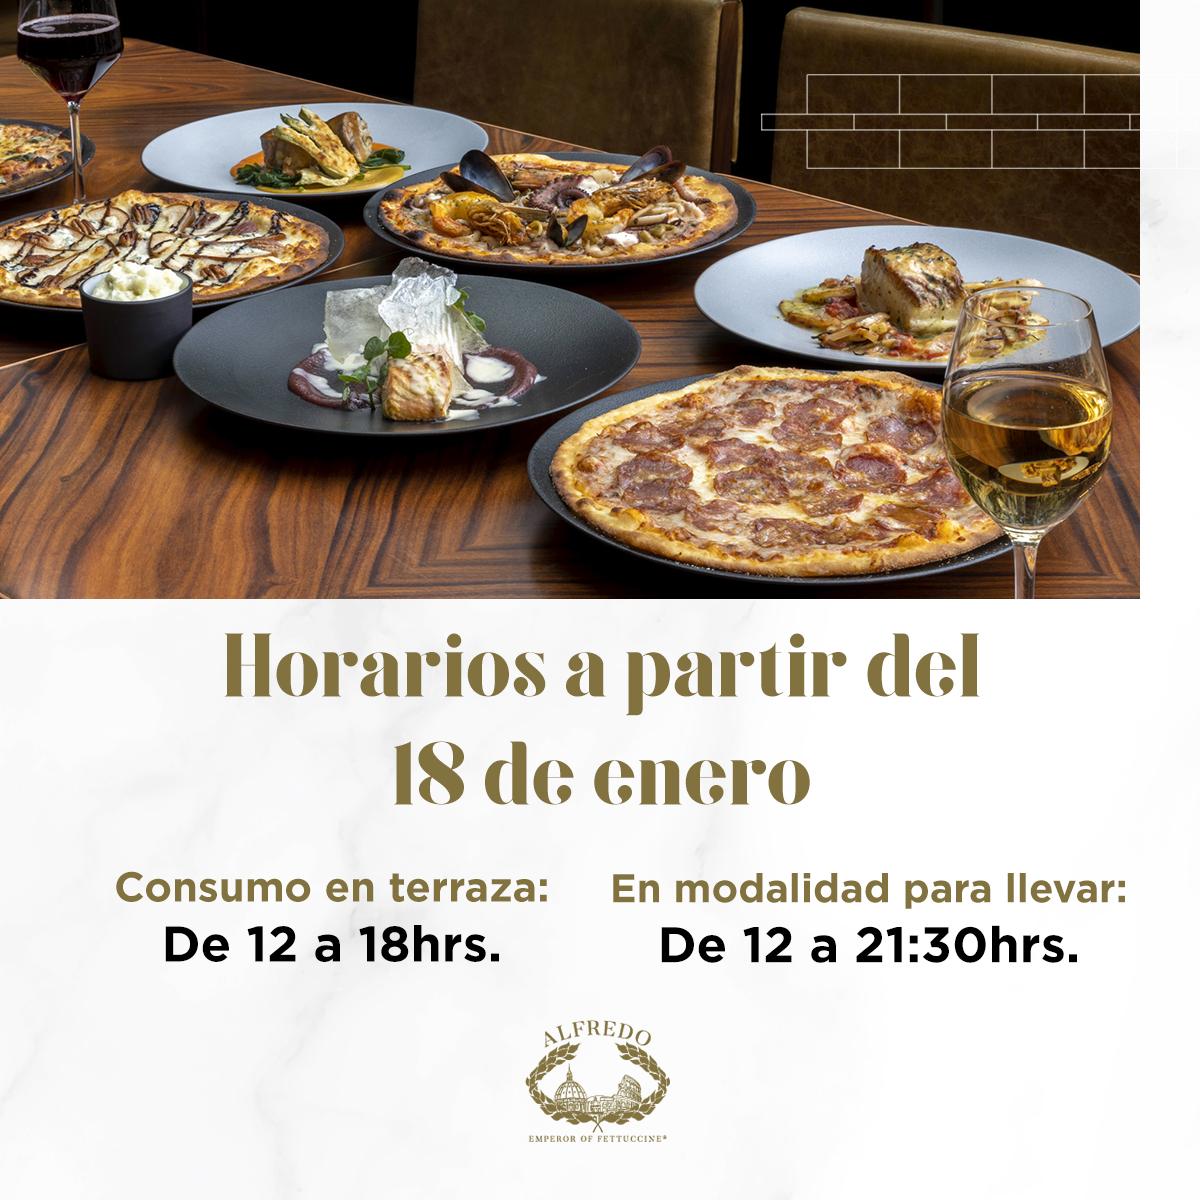 Nuestra área de terraza está lista para recibirte.   #Terraza #CocinaItaliana #FoodLover #Italian #GrupoPresidente #RestauranteItaliano #Pizza #Pasta #Vino #Wine #Cava https://t.co/RqT3889354